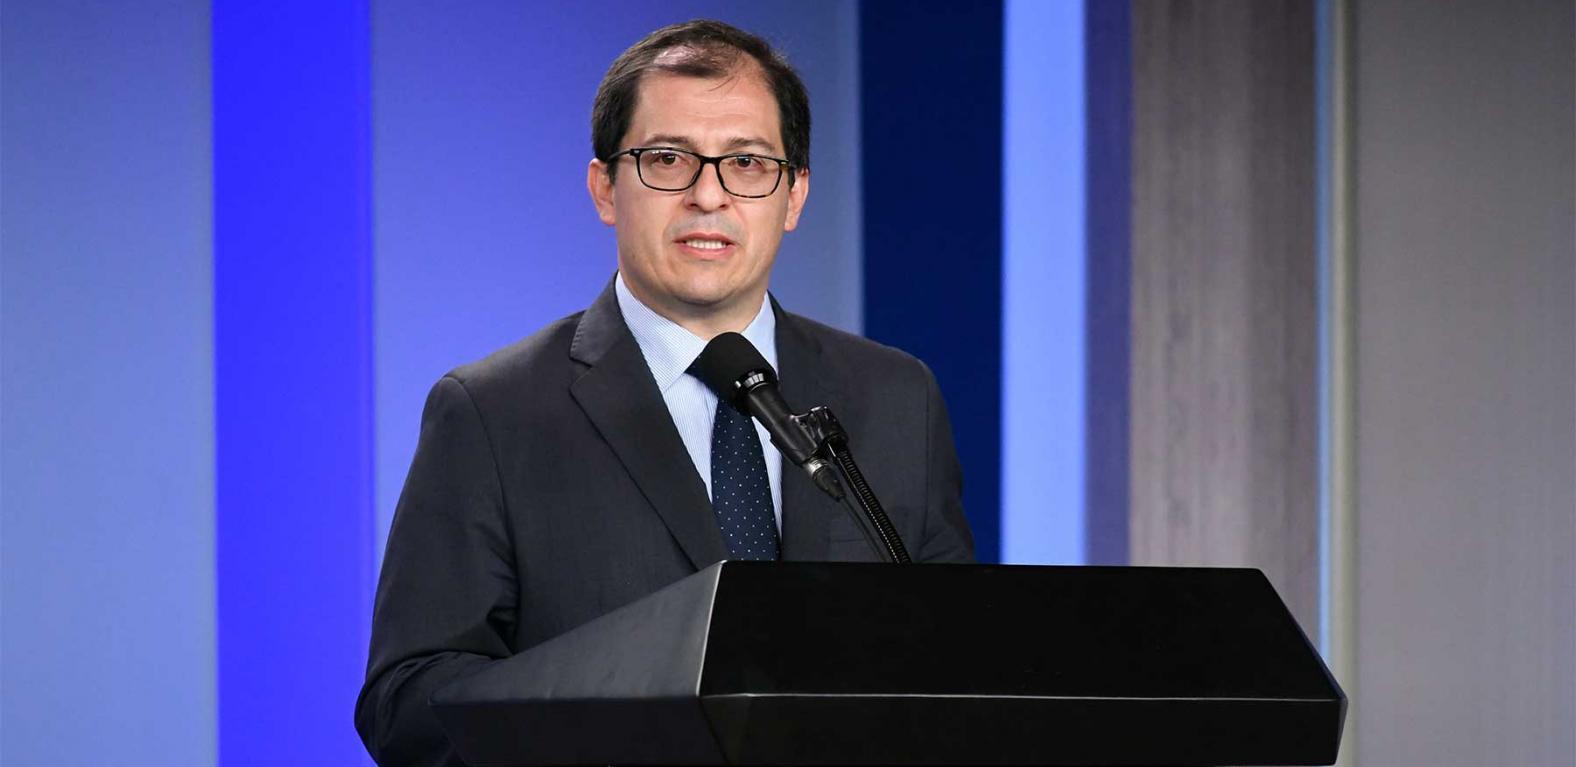 Francisco Barbosa a cinco votos de ser elegido fiscal general ...